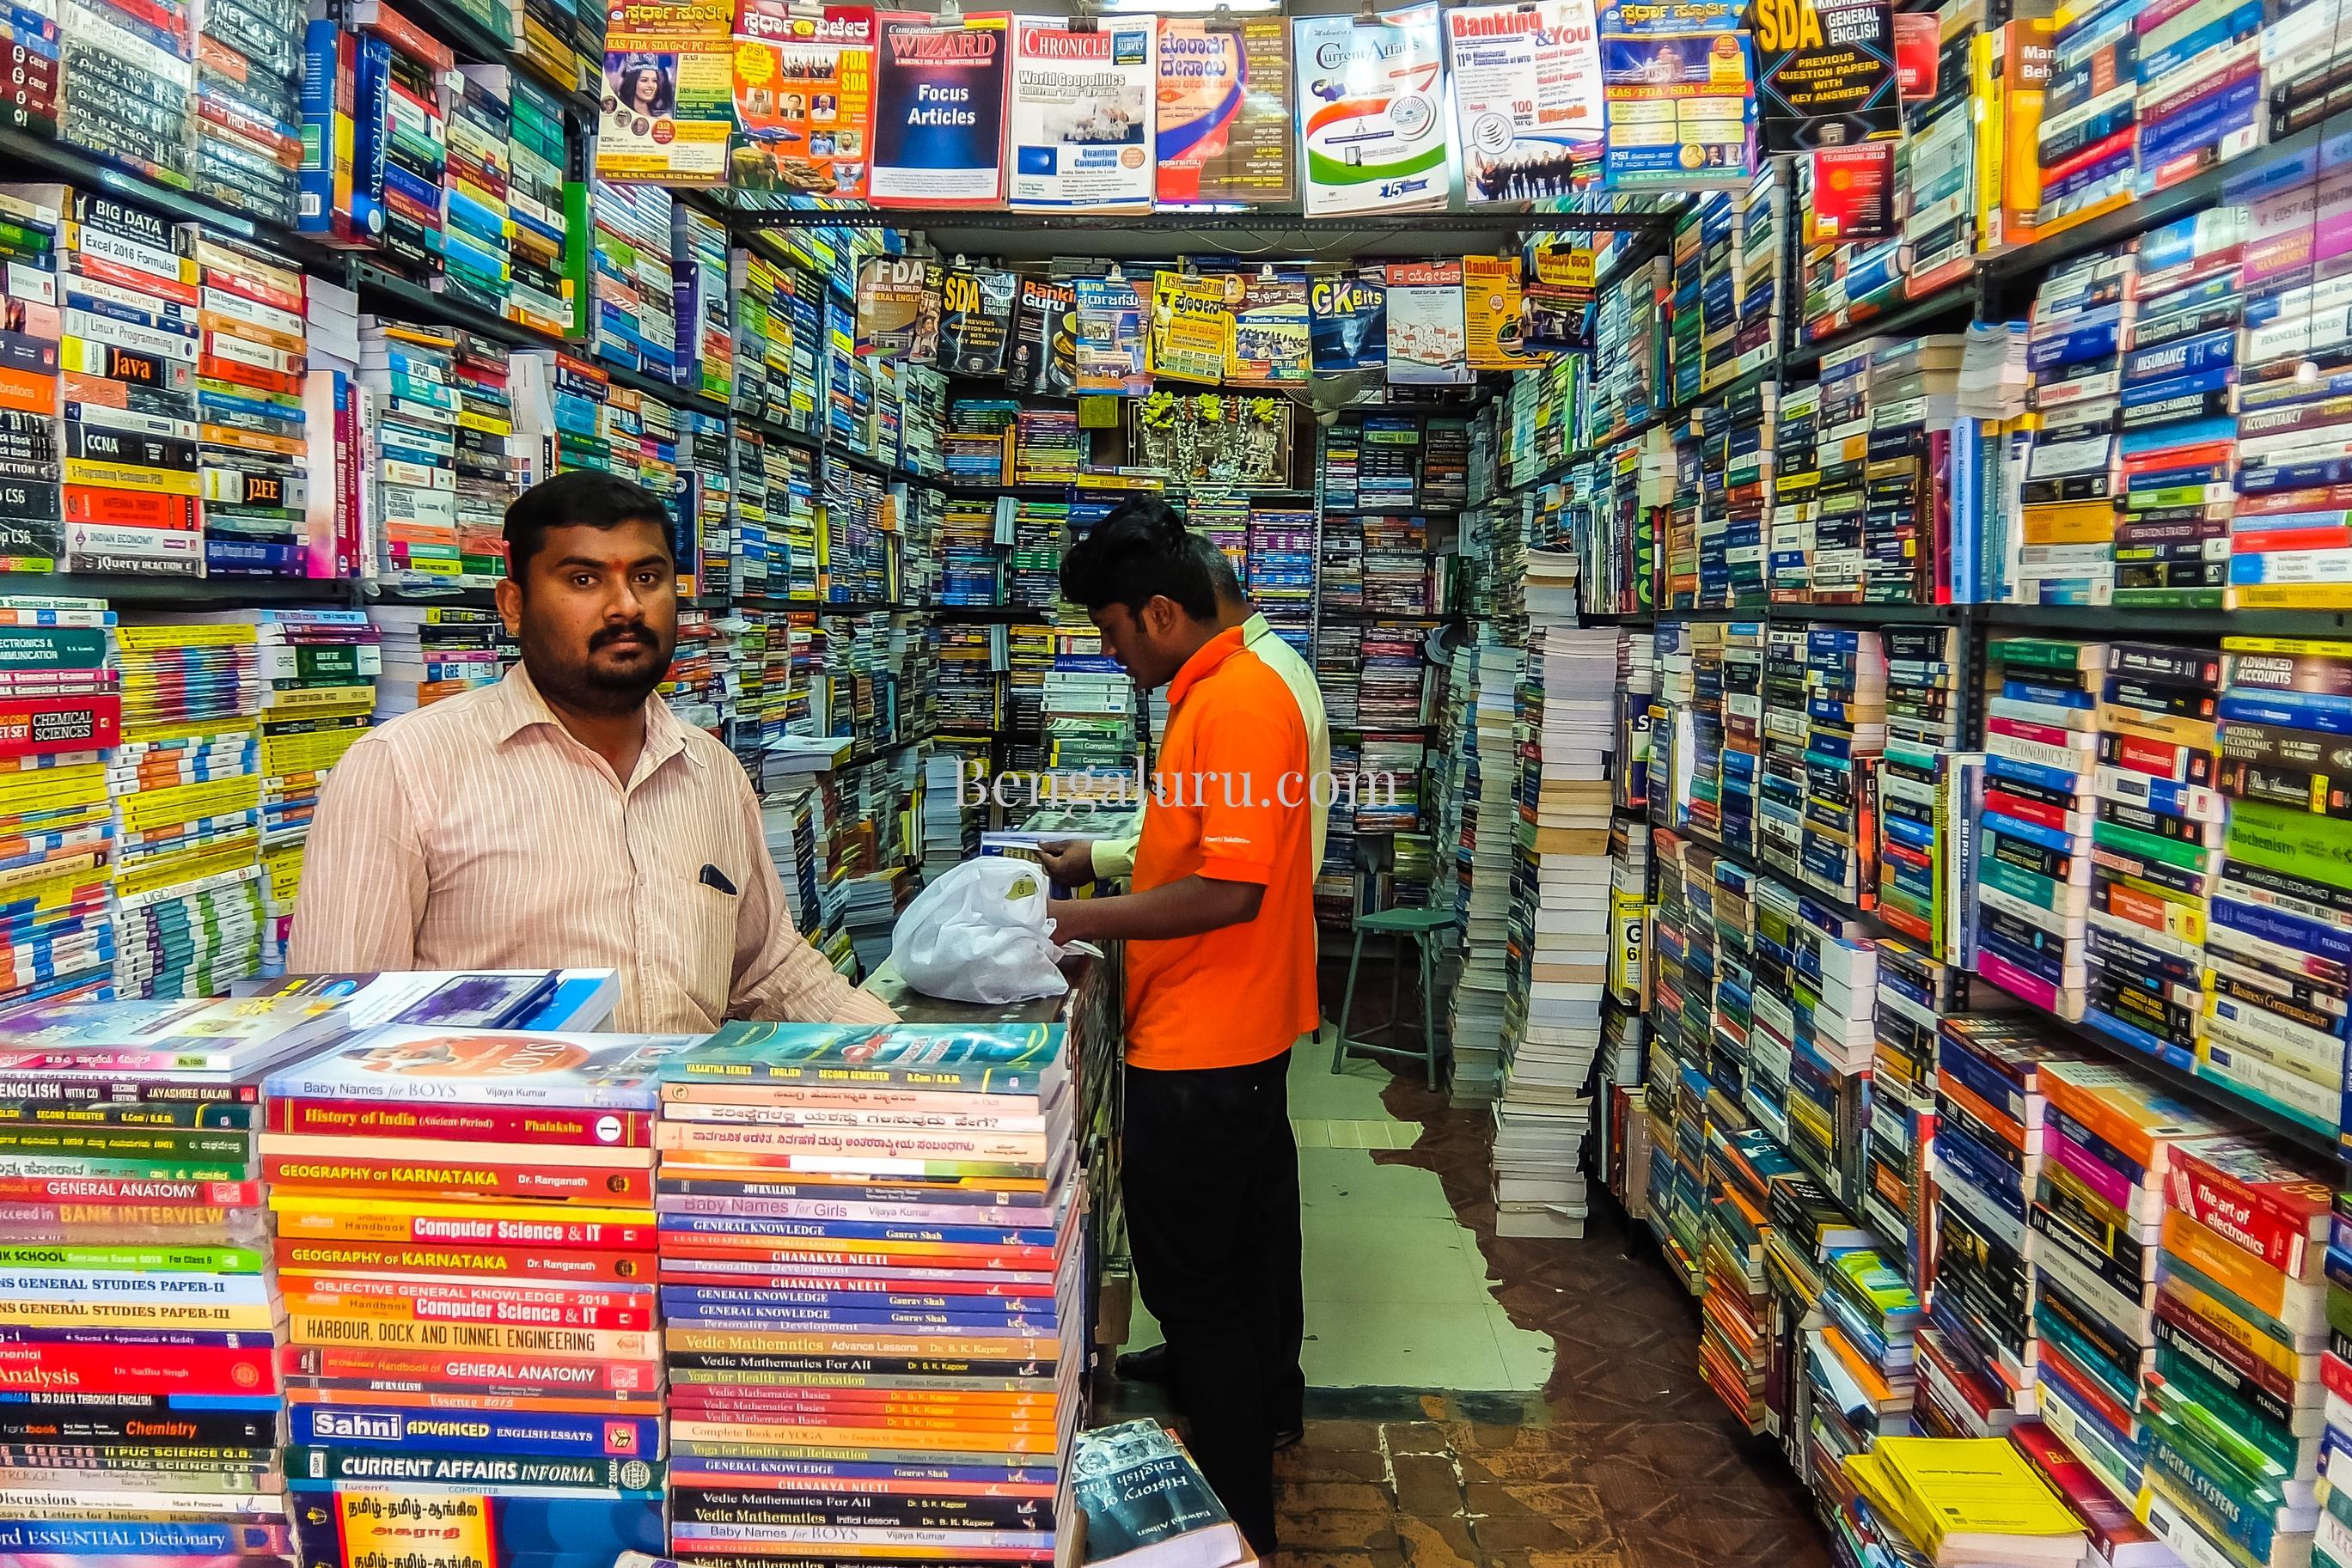 Bengaluru - Bookshop